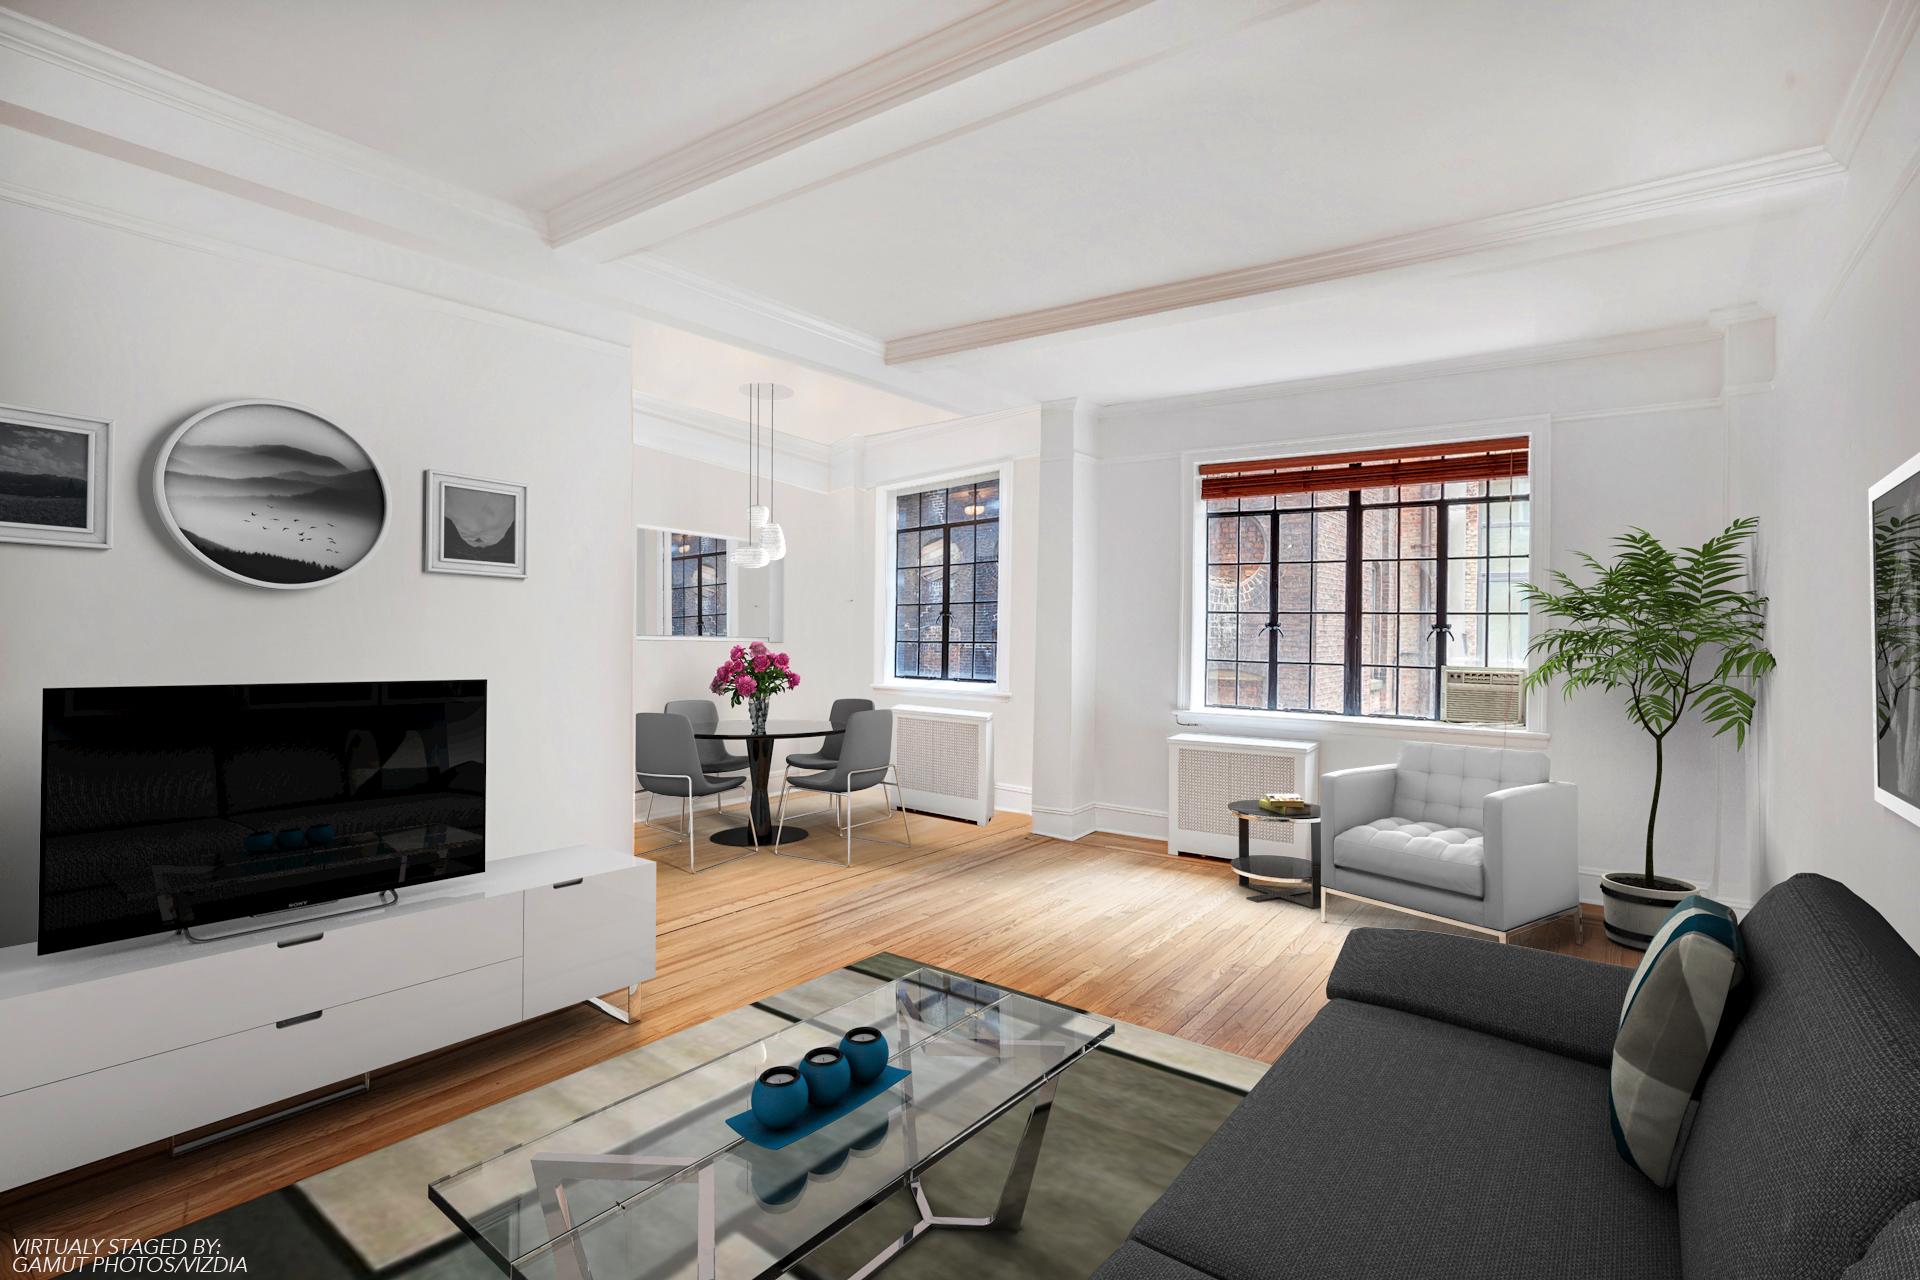 210 West 78th Street, #2C3C - $1,695,000